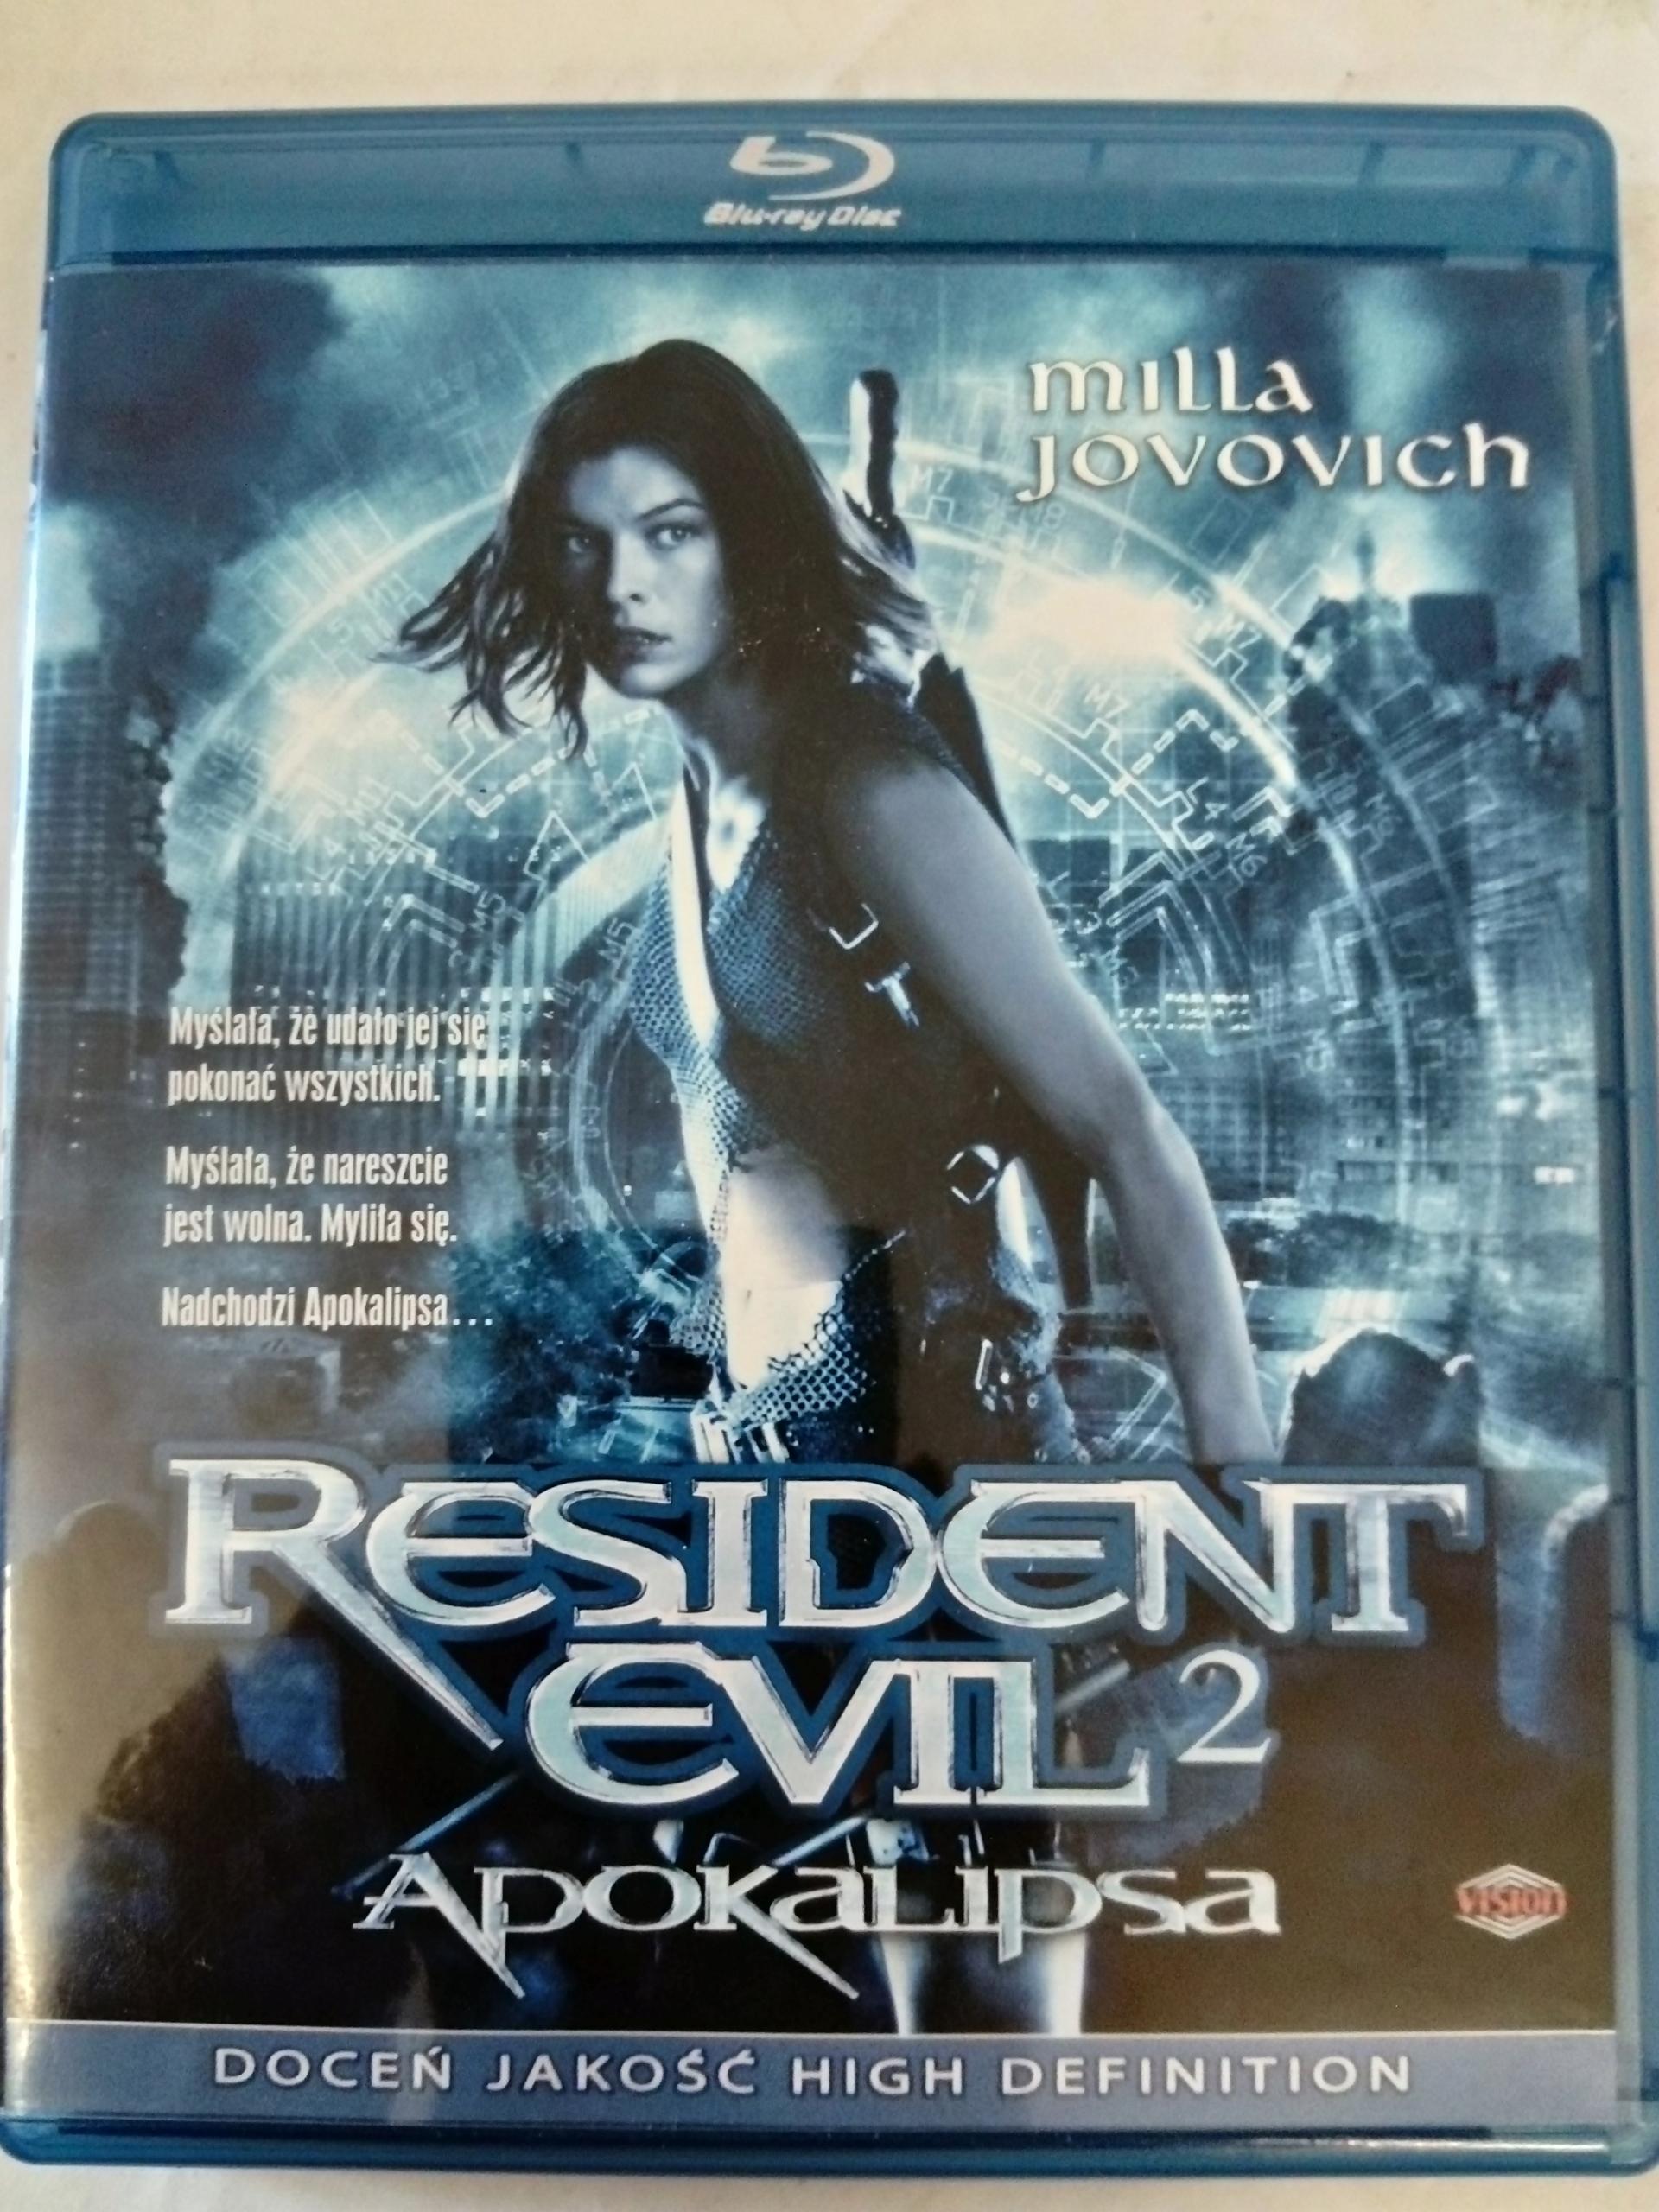 RESIDENT EVIL 2: APOKALIPSA (BLU-RAY)